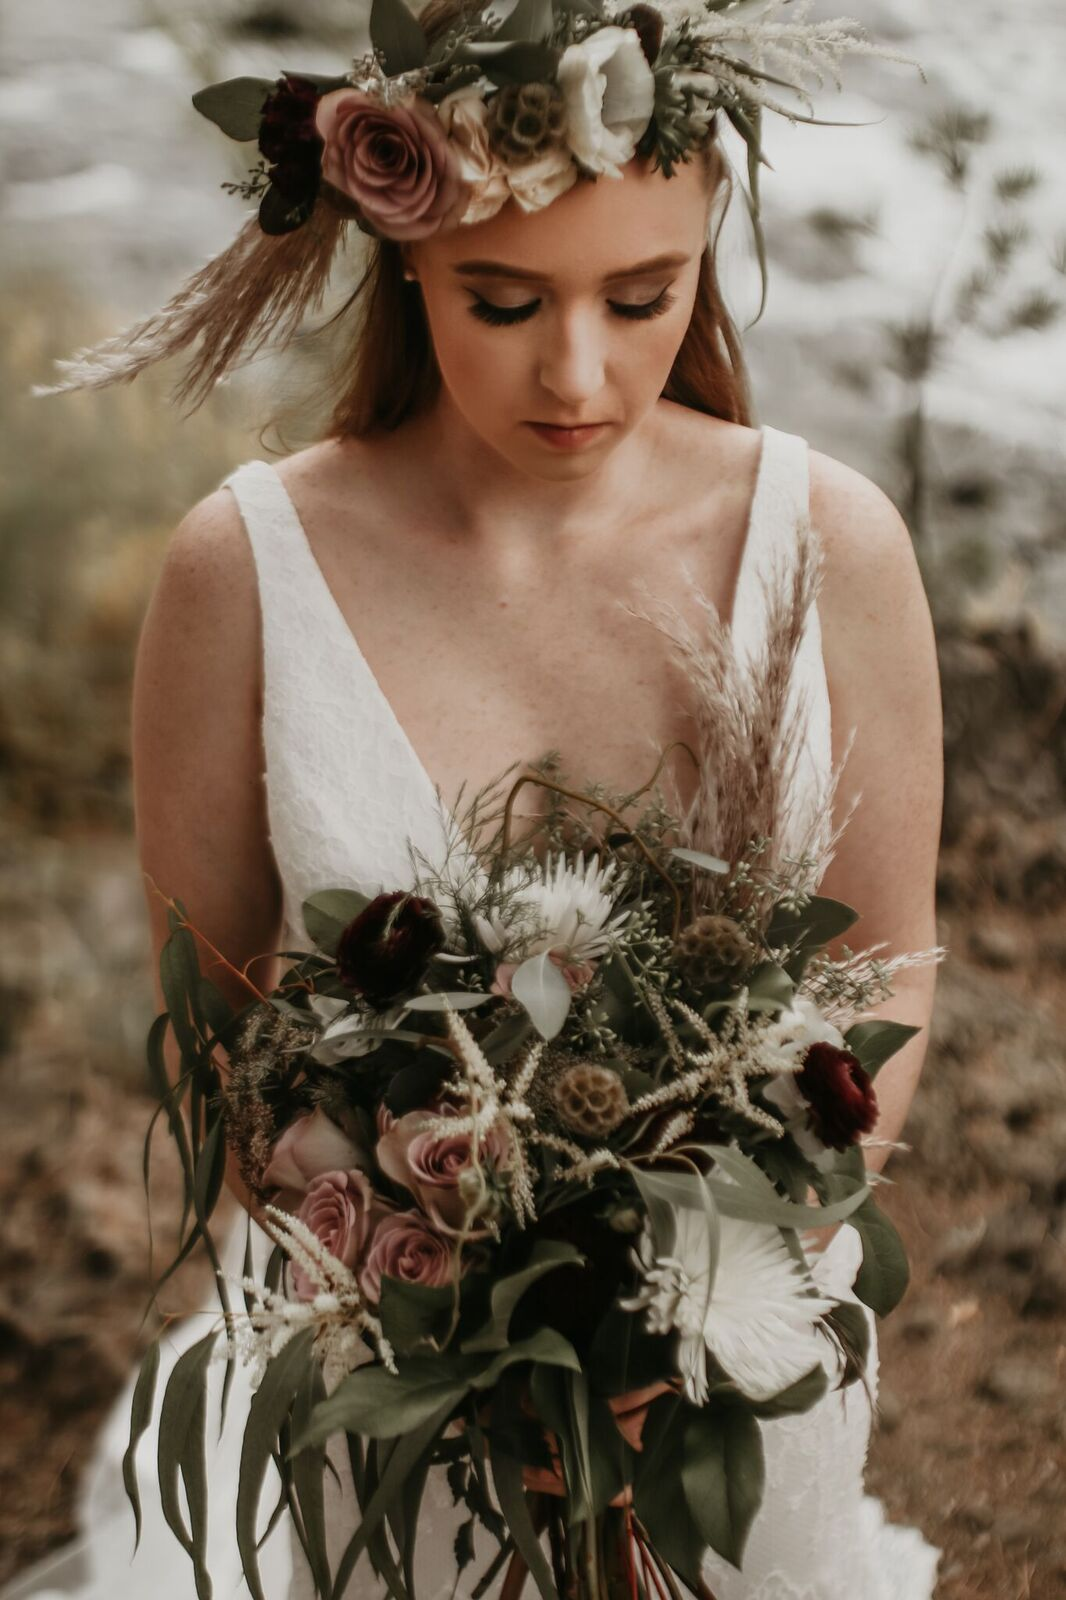 spokane river wedding photo shoot image